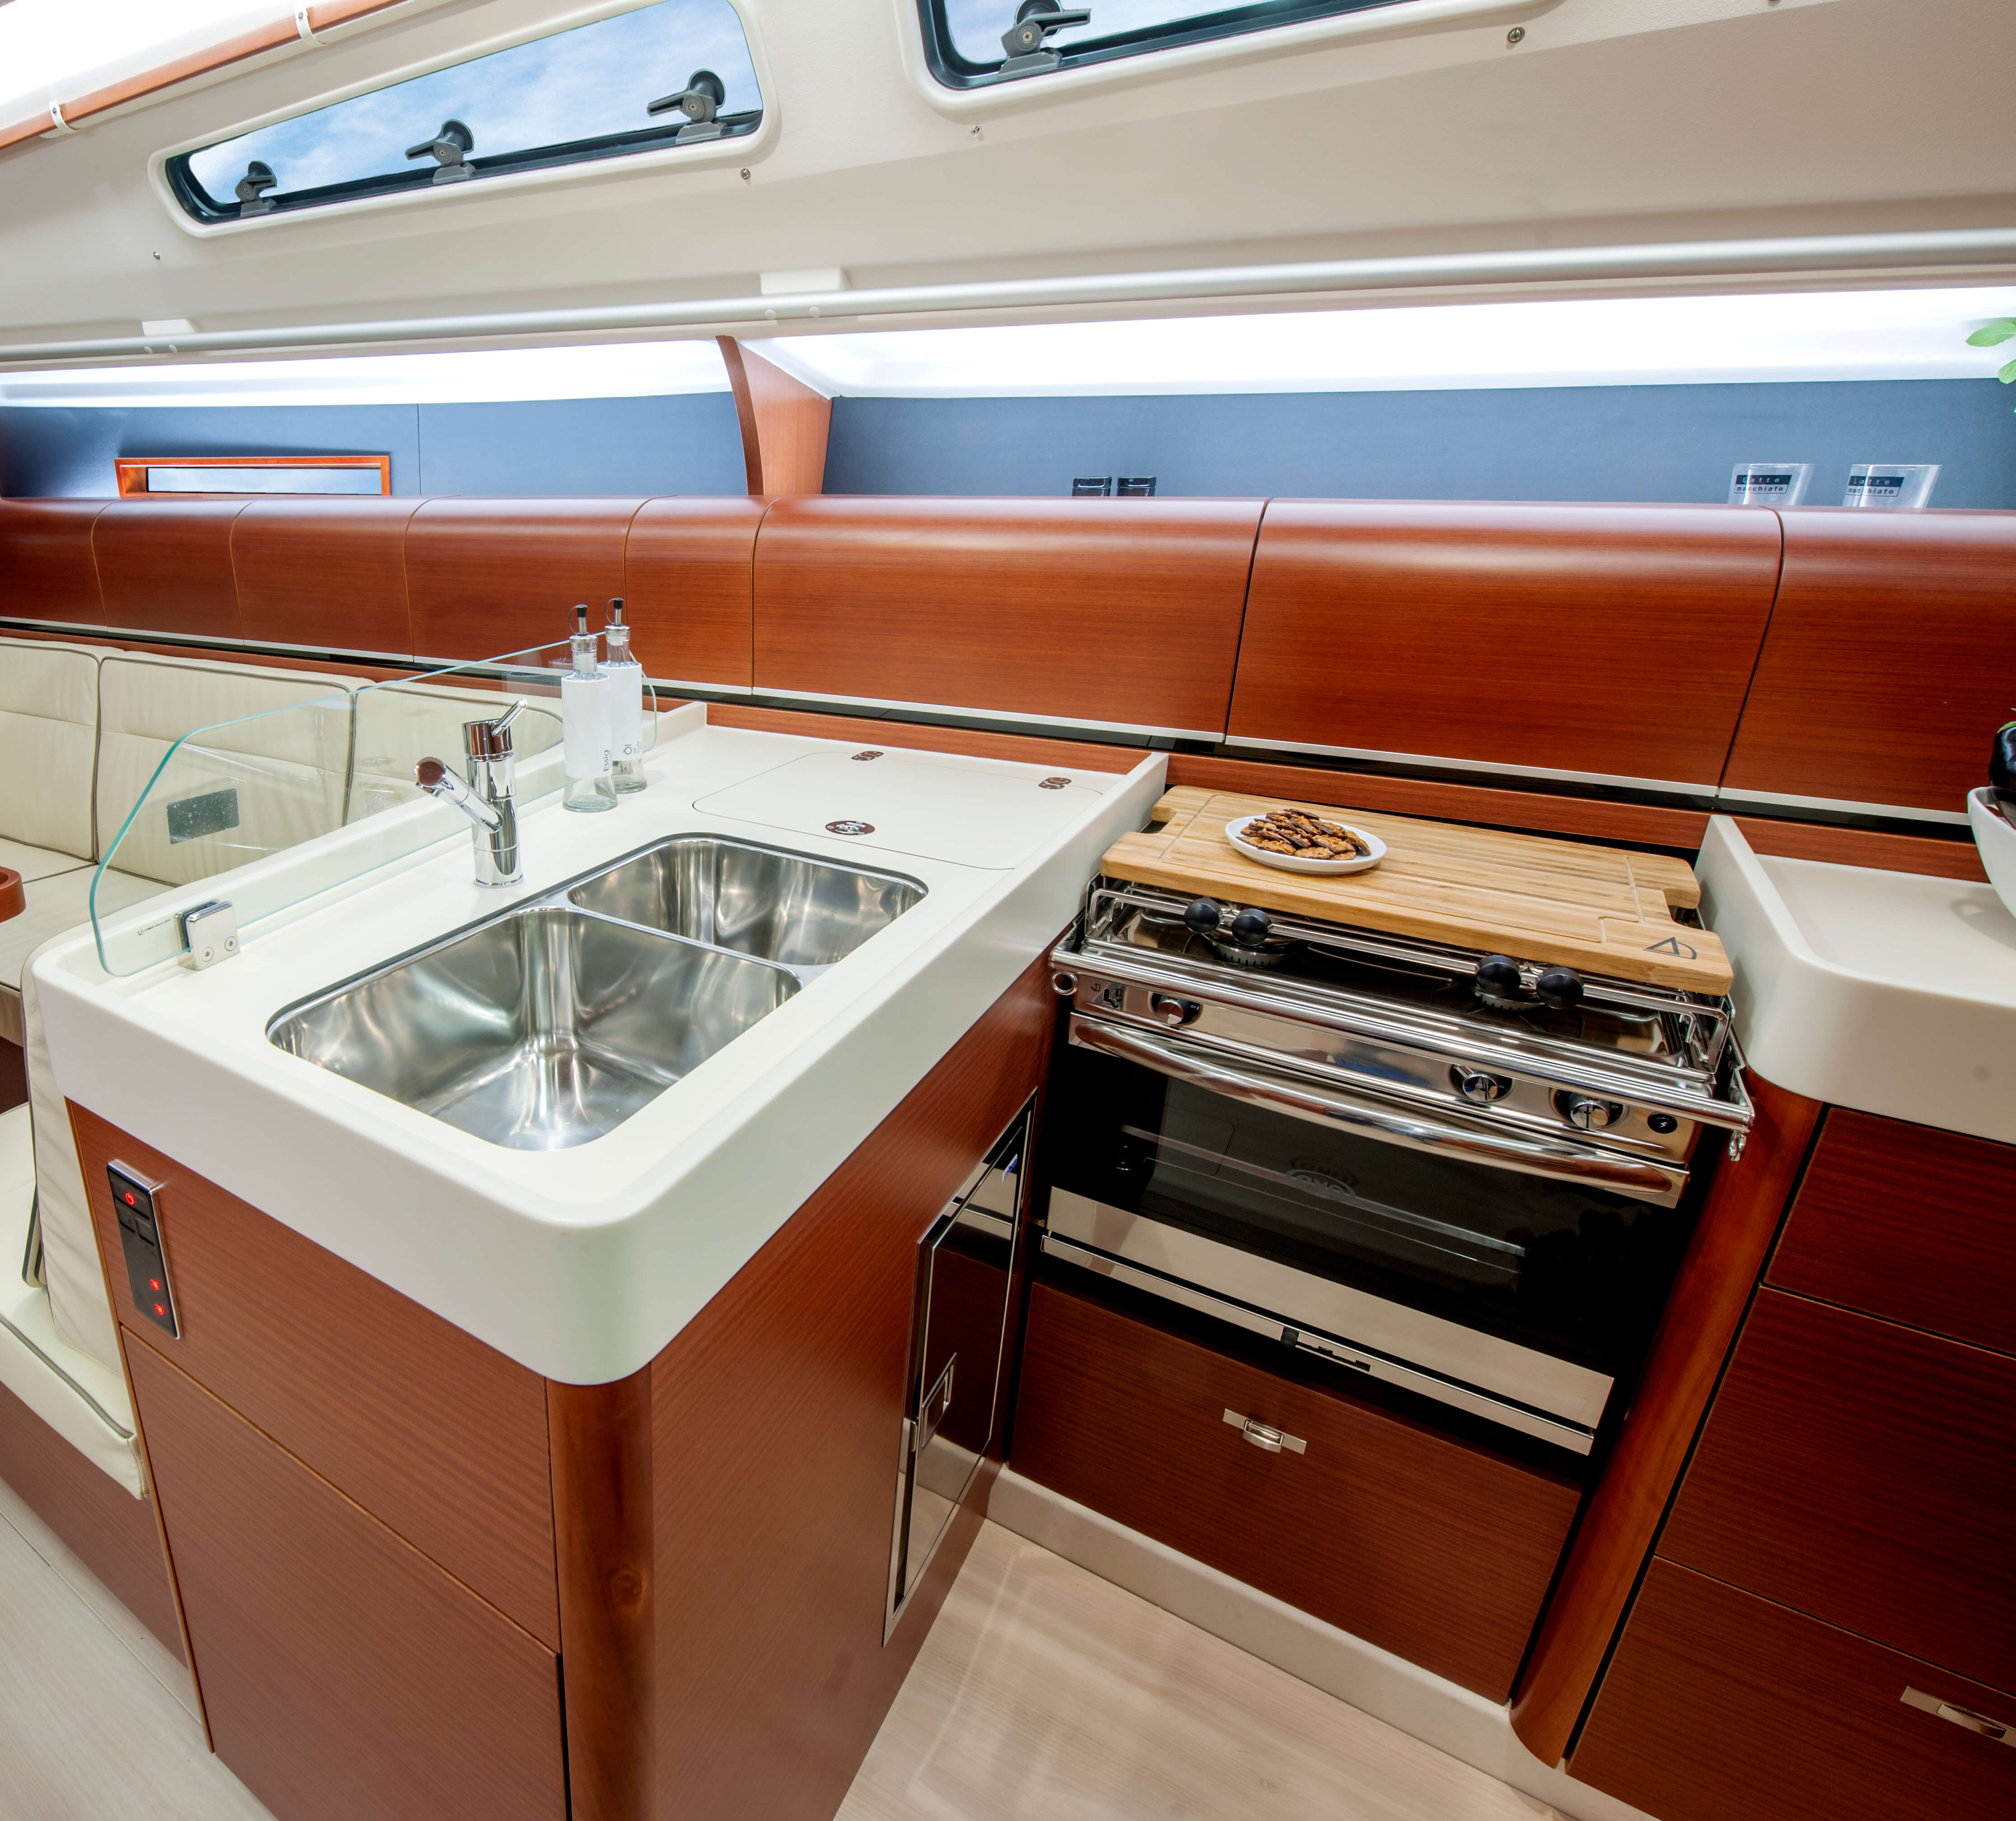 Dehler 42 Interior view pantry | sink, stove, stove cover, fridge | Dehler